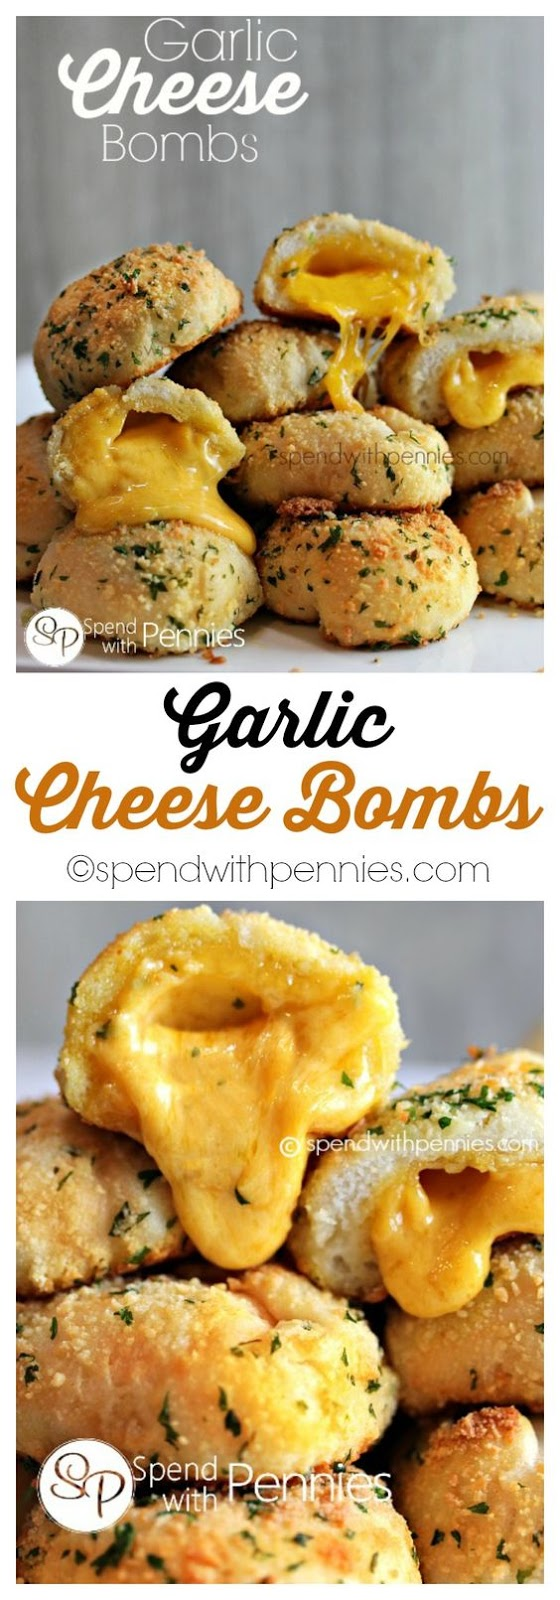 Garlic Cheddar Biscuits (Garlic Cheese Bombs)